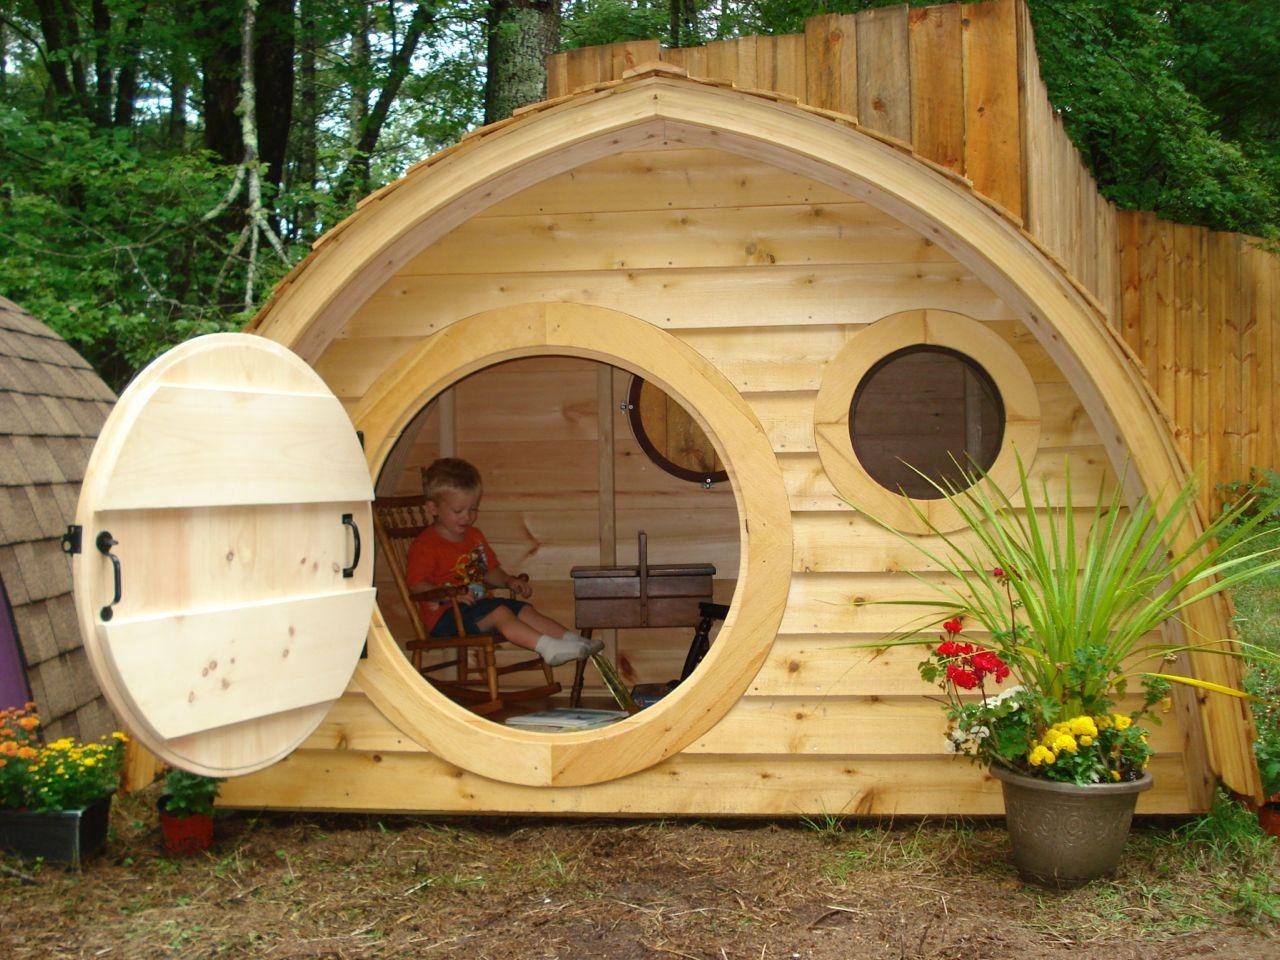 hobbit hole playhouse with round front door and by hobbitholes hobbit hole playhouse with round front door and by hobbitholes 2 995 00